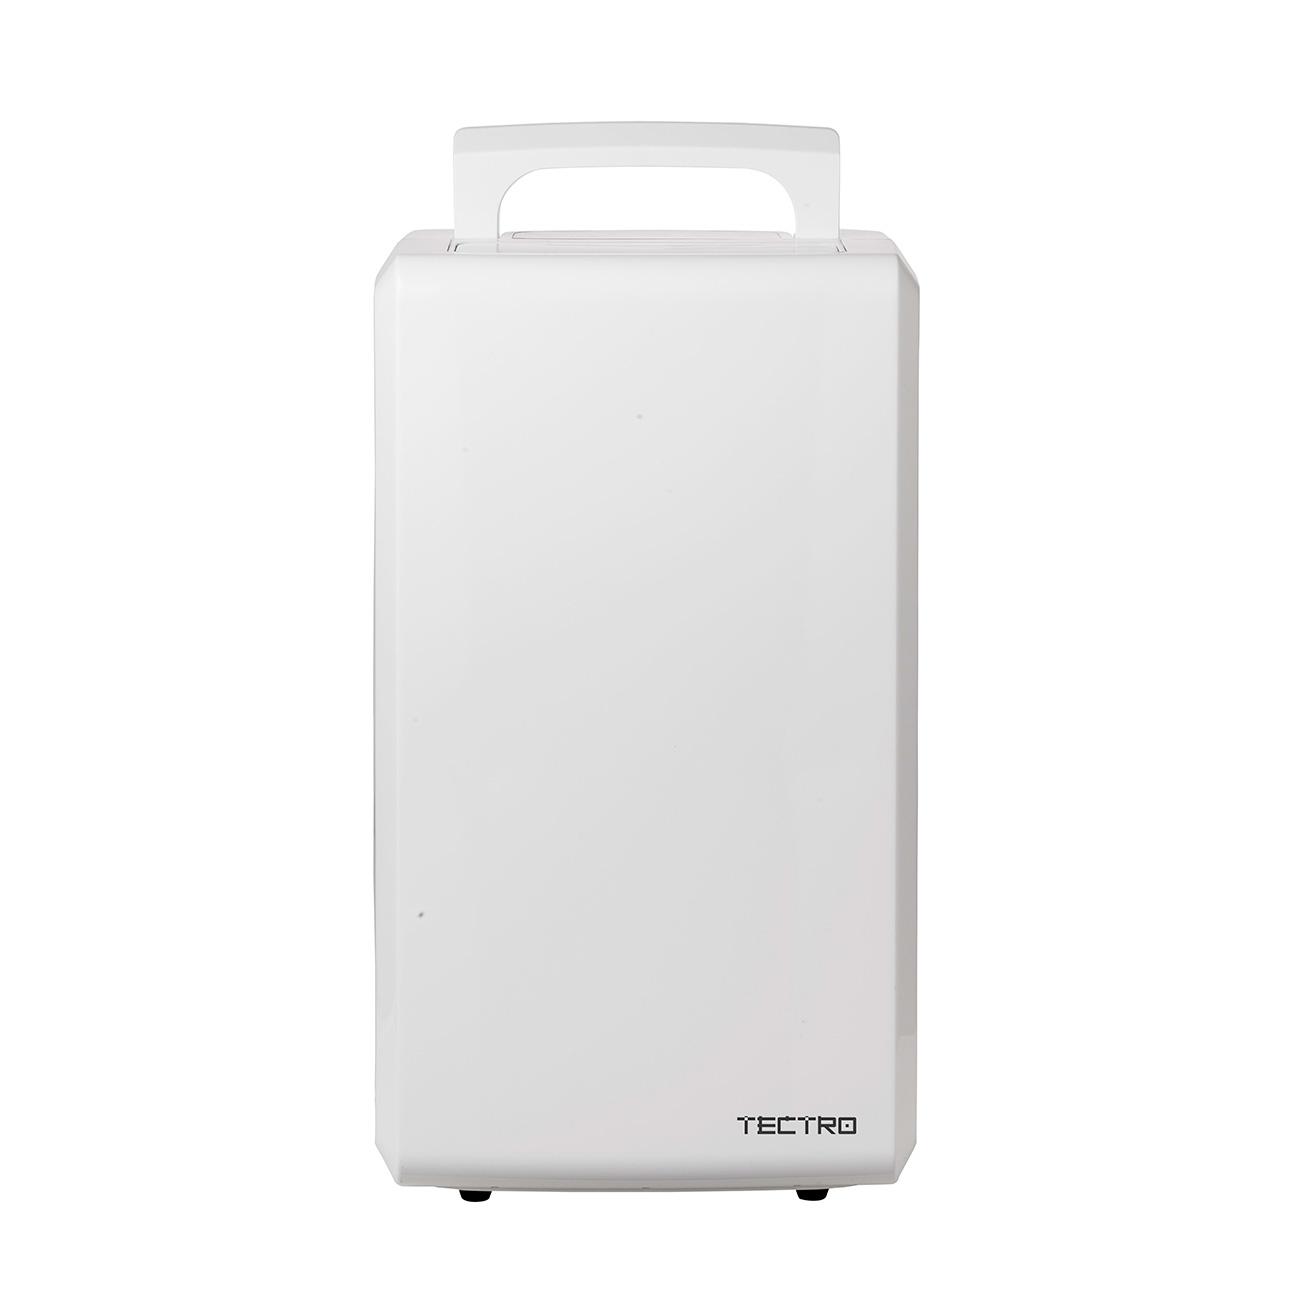 Deshumidificador portátil Qlima Tectro TD1010